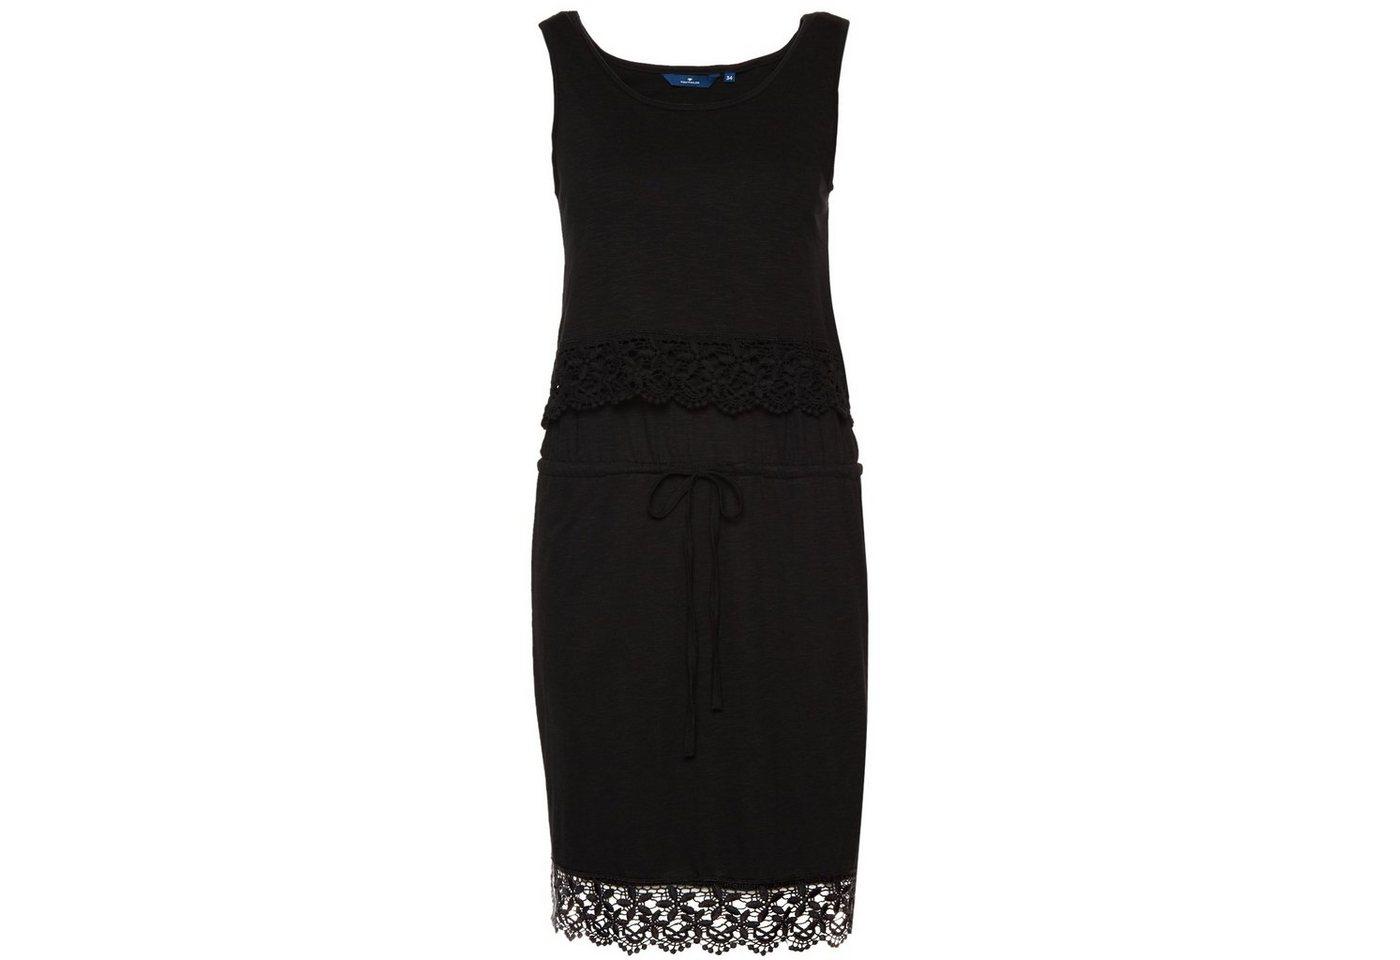 Tom Tailor jurk jurk met details van kant zwart